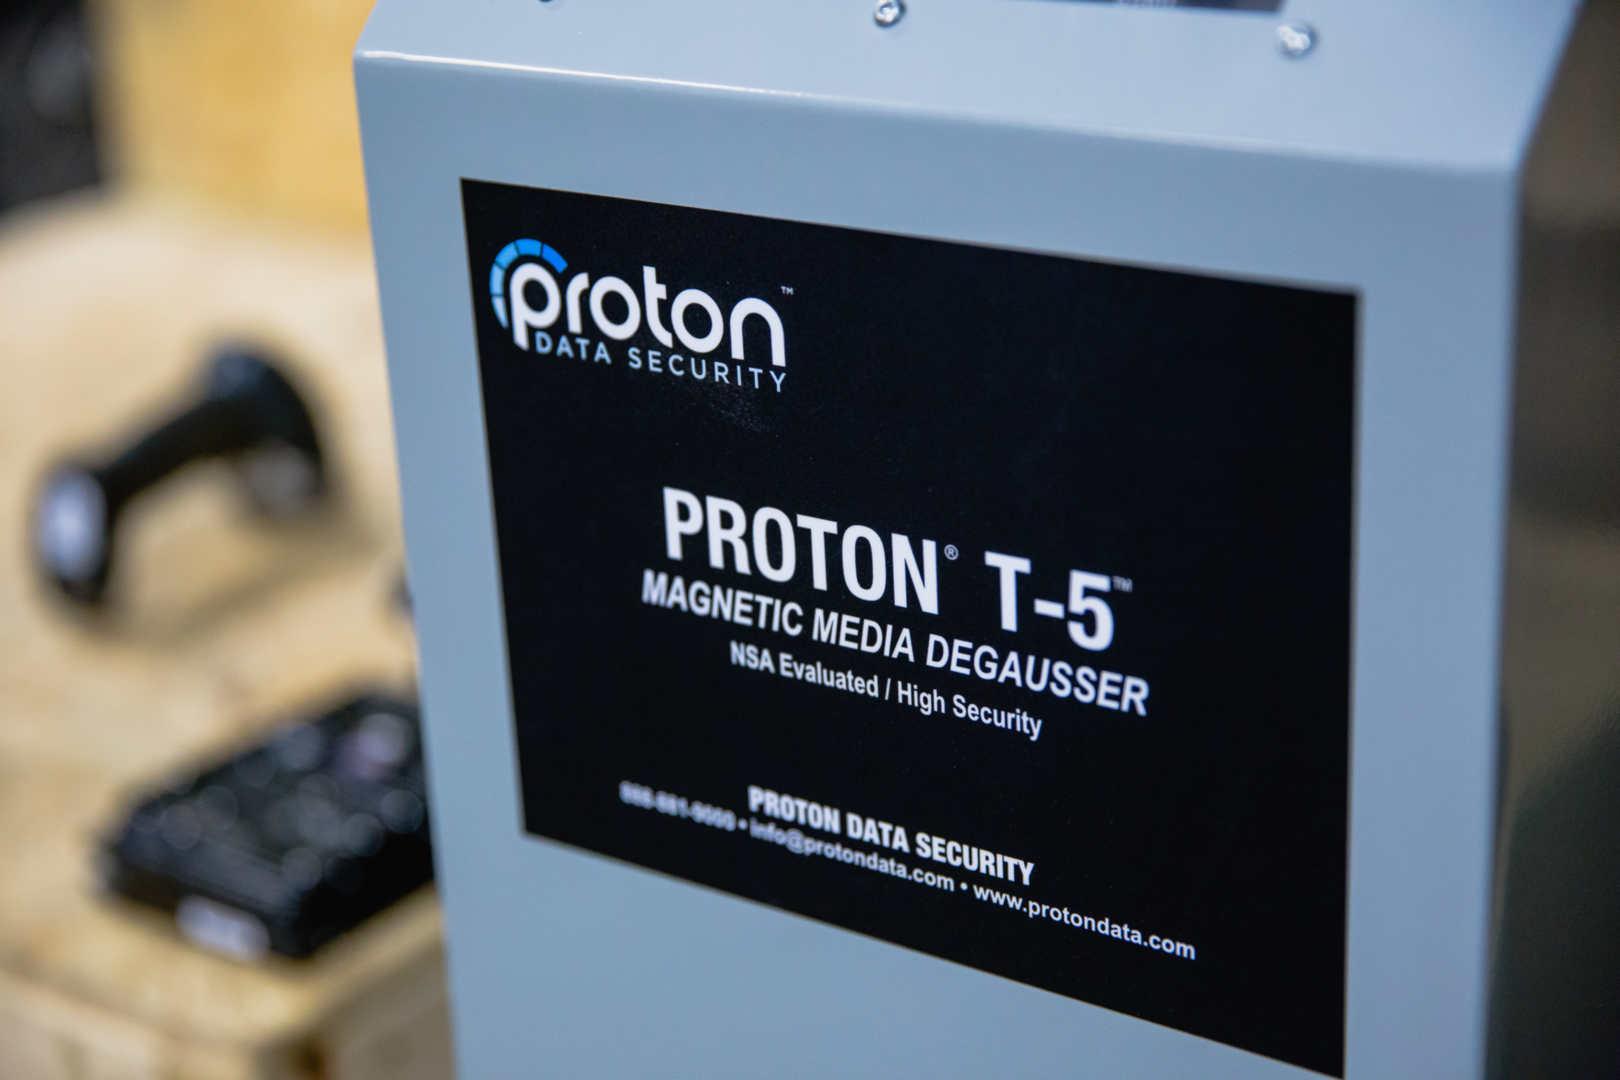 proton t5 media degausser